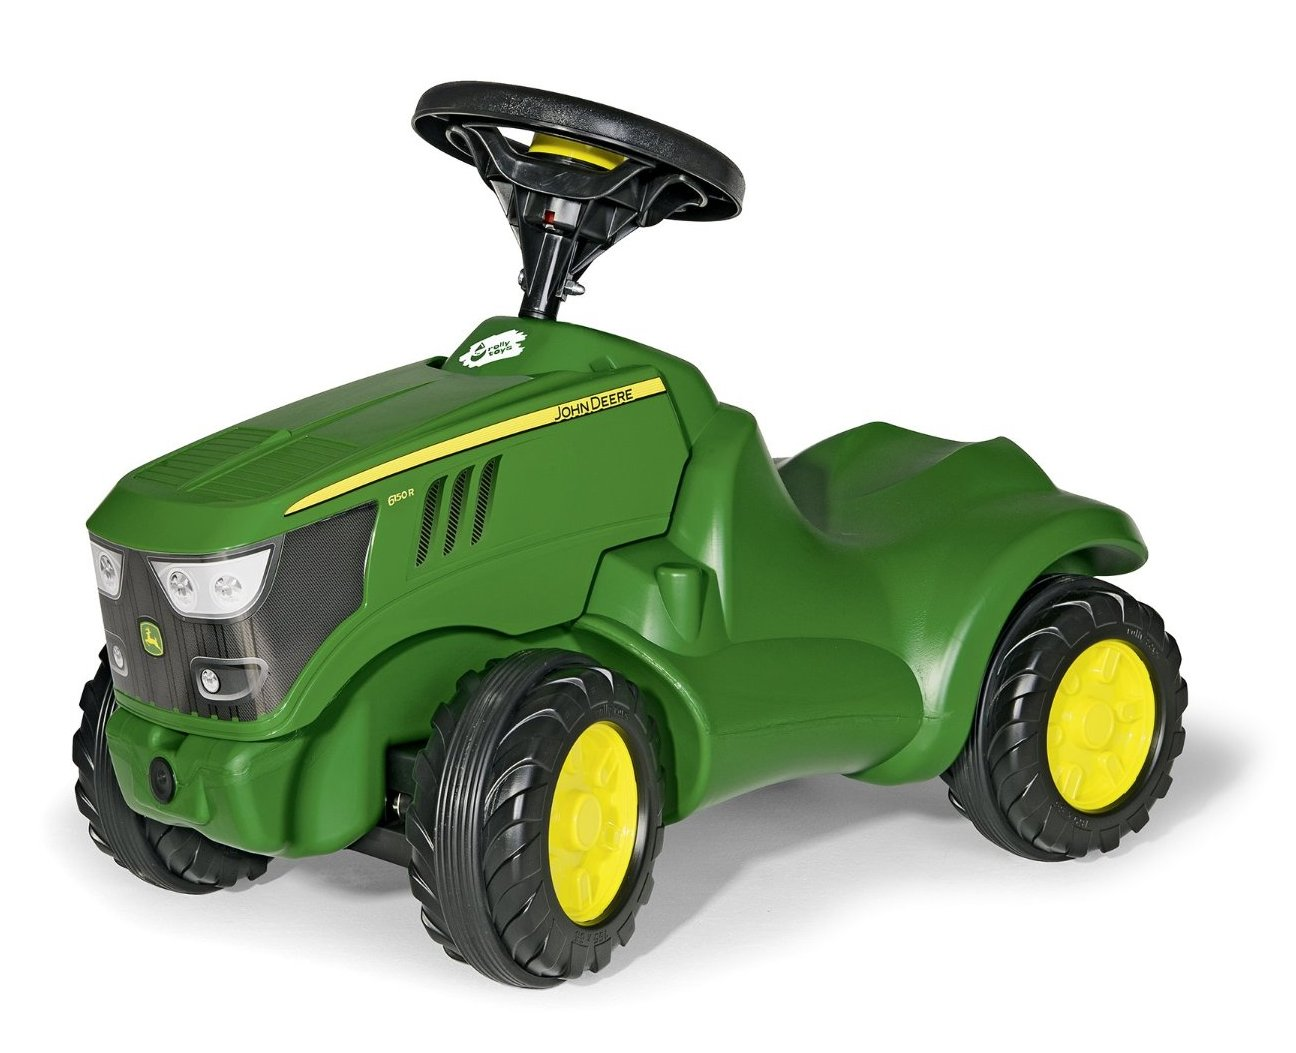 Masinuta fara pedale, John Deere 6150 R, Rolly Toys